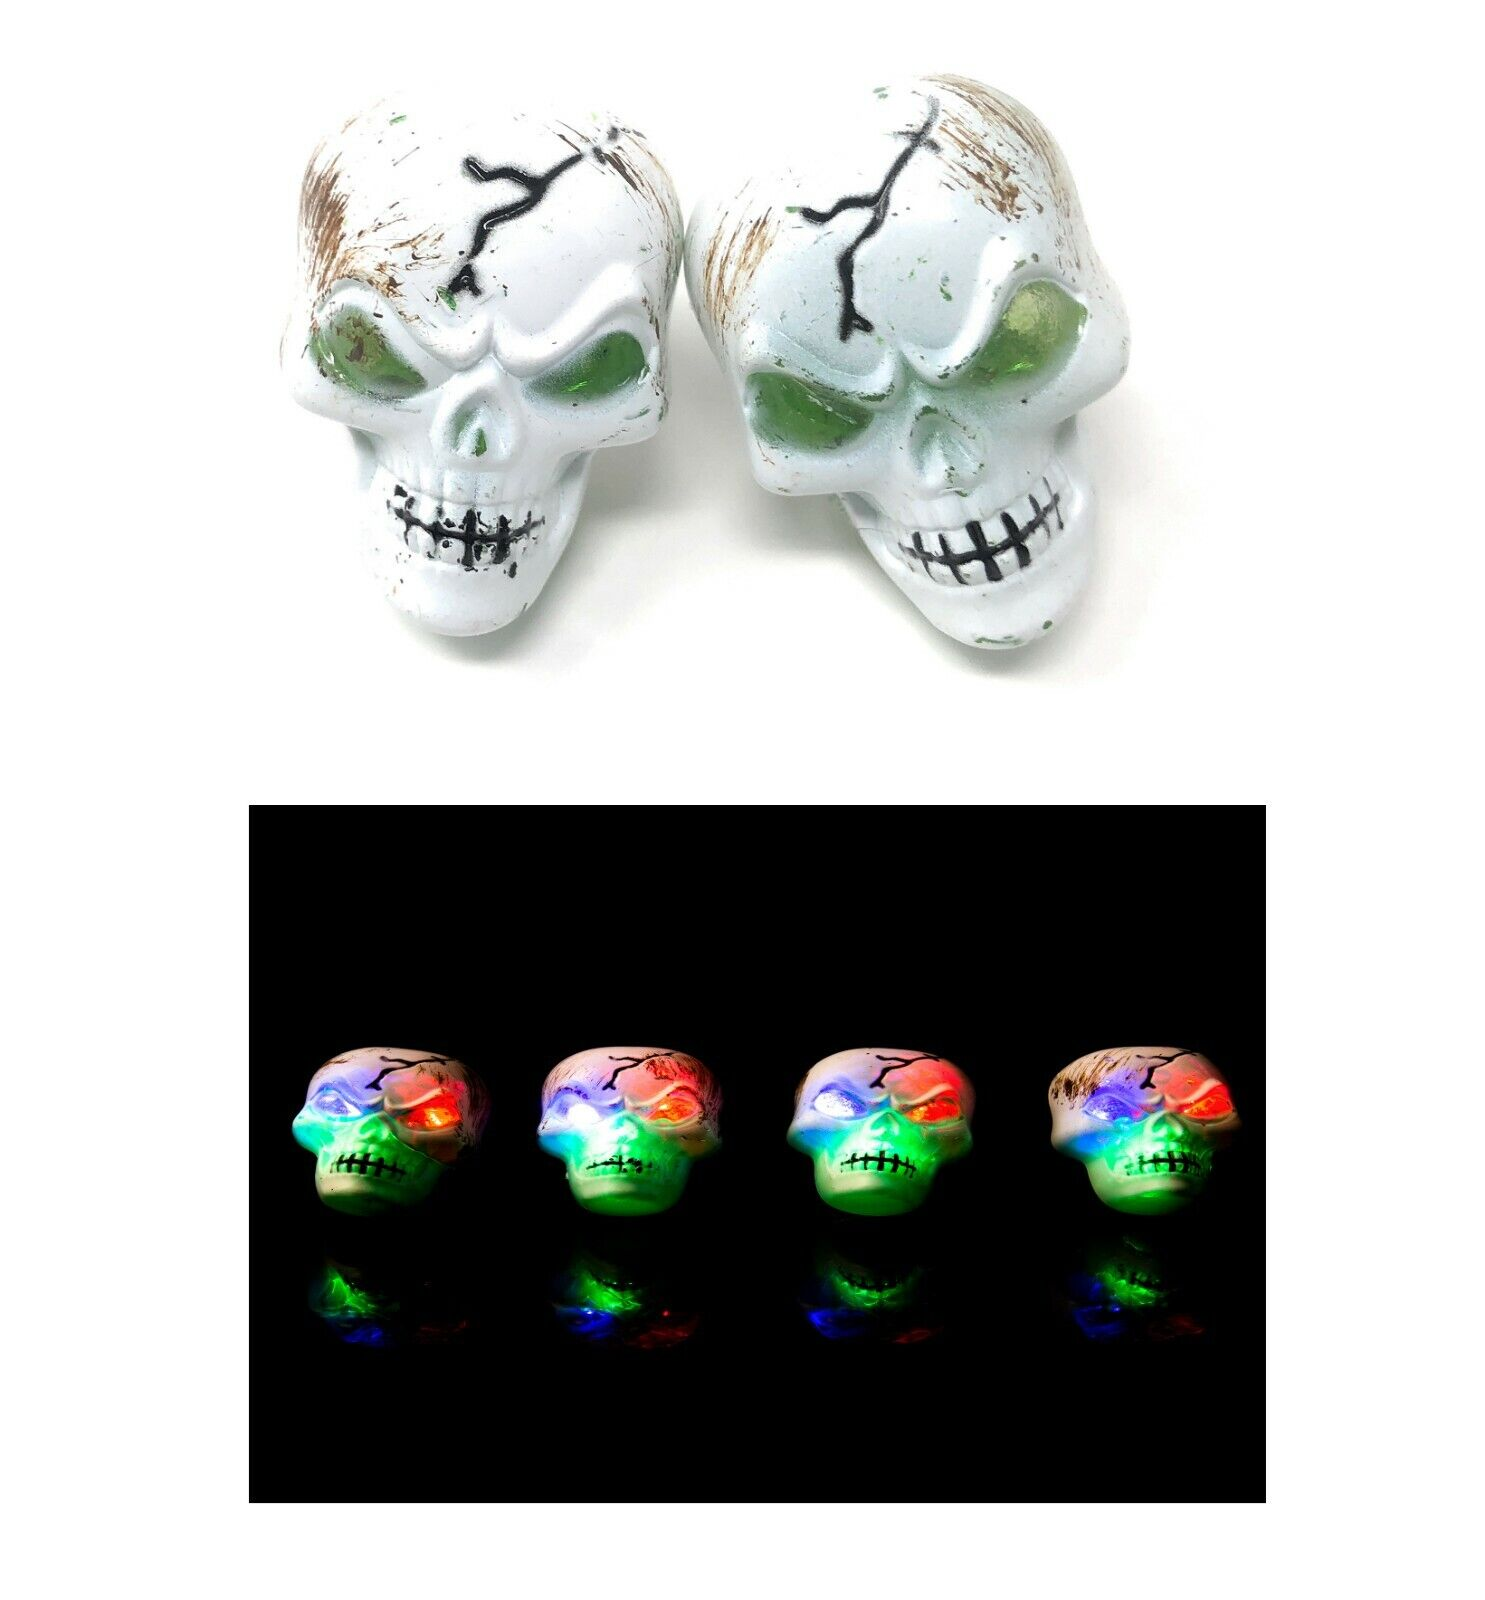 48 Skeleton Flashing LED Plastic Rings Light Up Finger Glow Toy Party Bag Favors